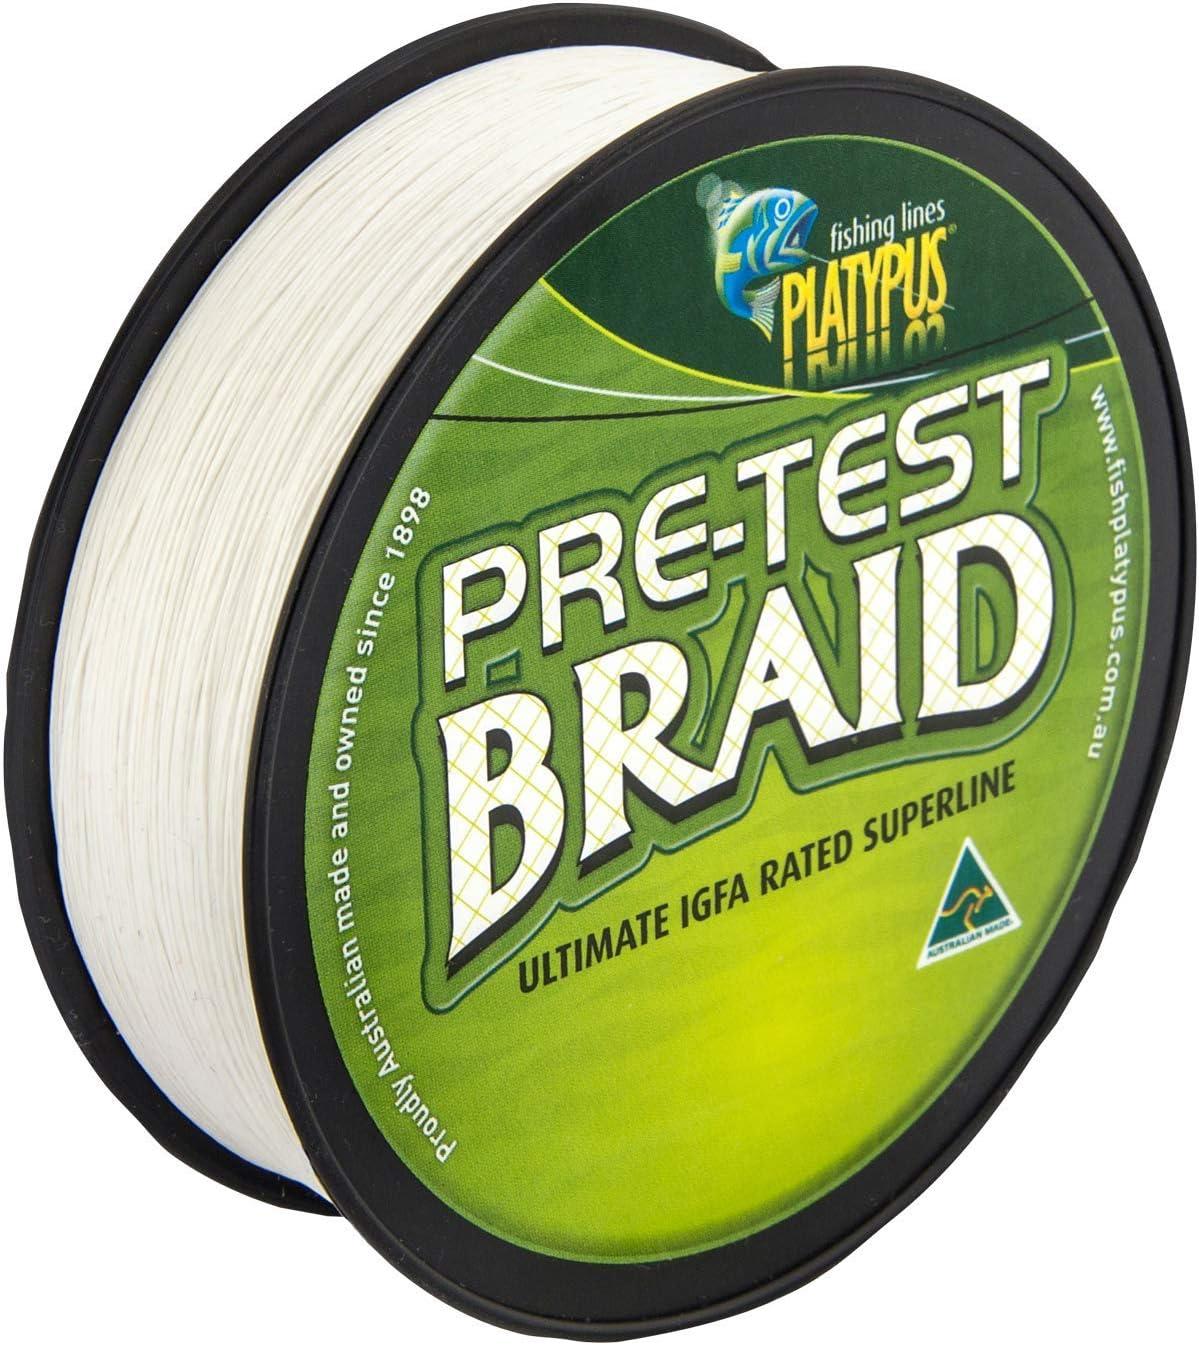 World/'s Best Since 1898 Platypus IGFA Pre-test Fishing Braid White or Green